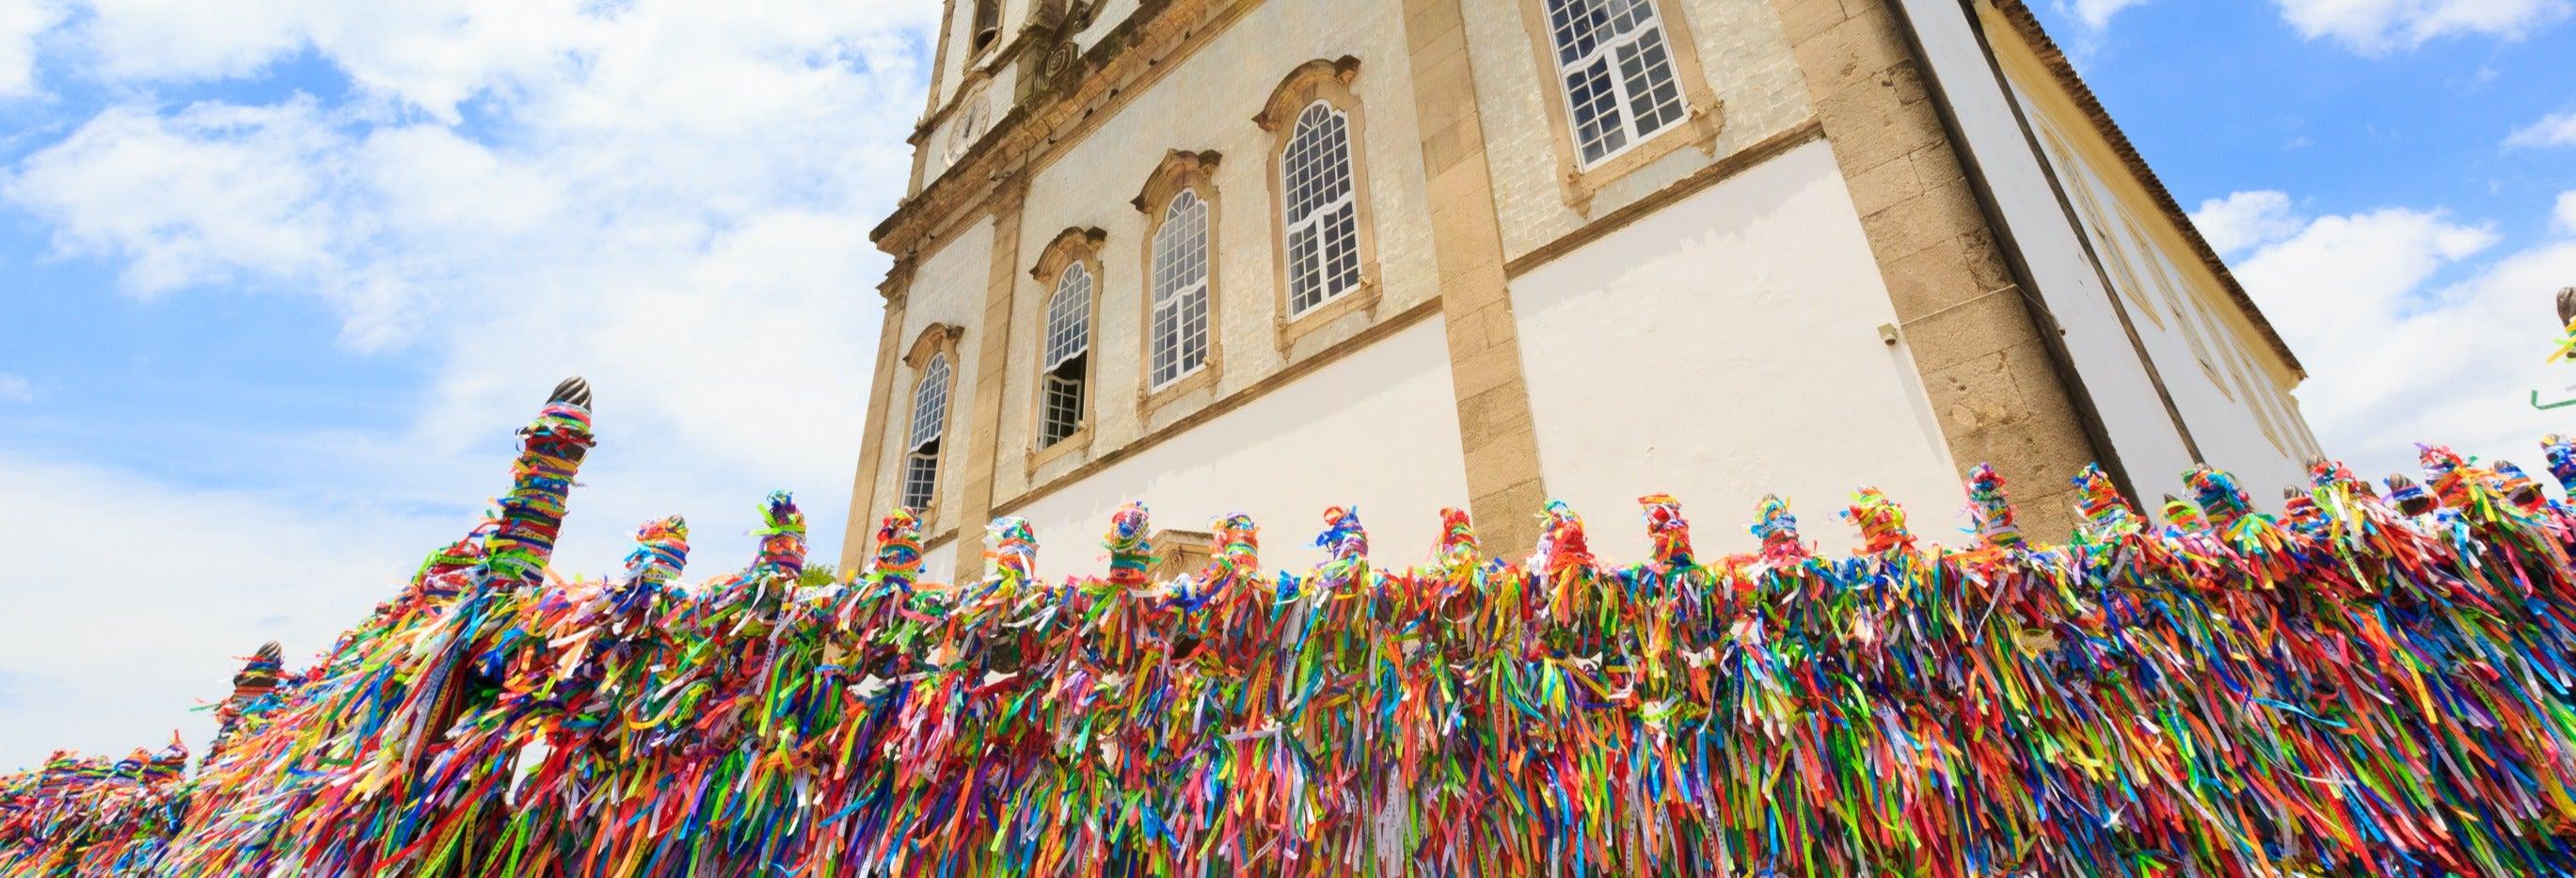 Tour panorámico por Salvador de Bahía